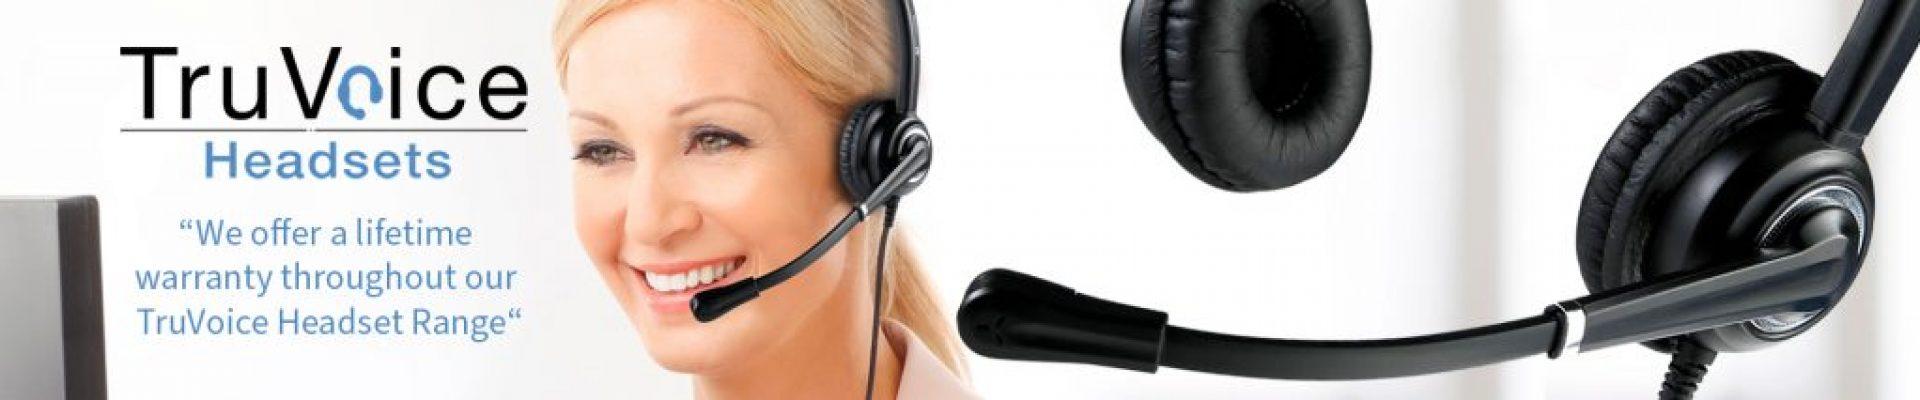 tuvoice-headsets-imagebar-2a